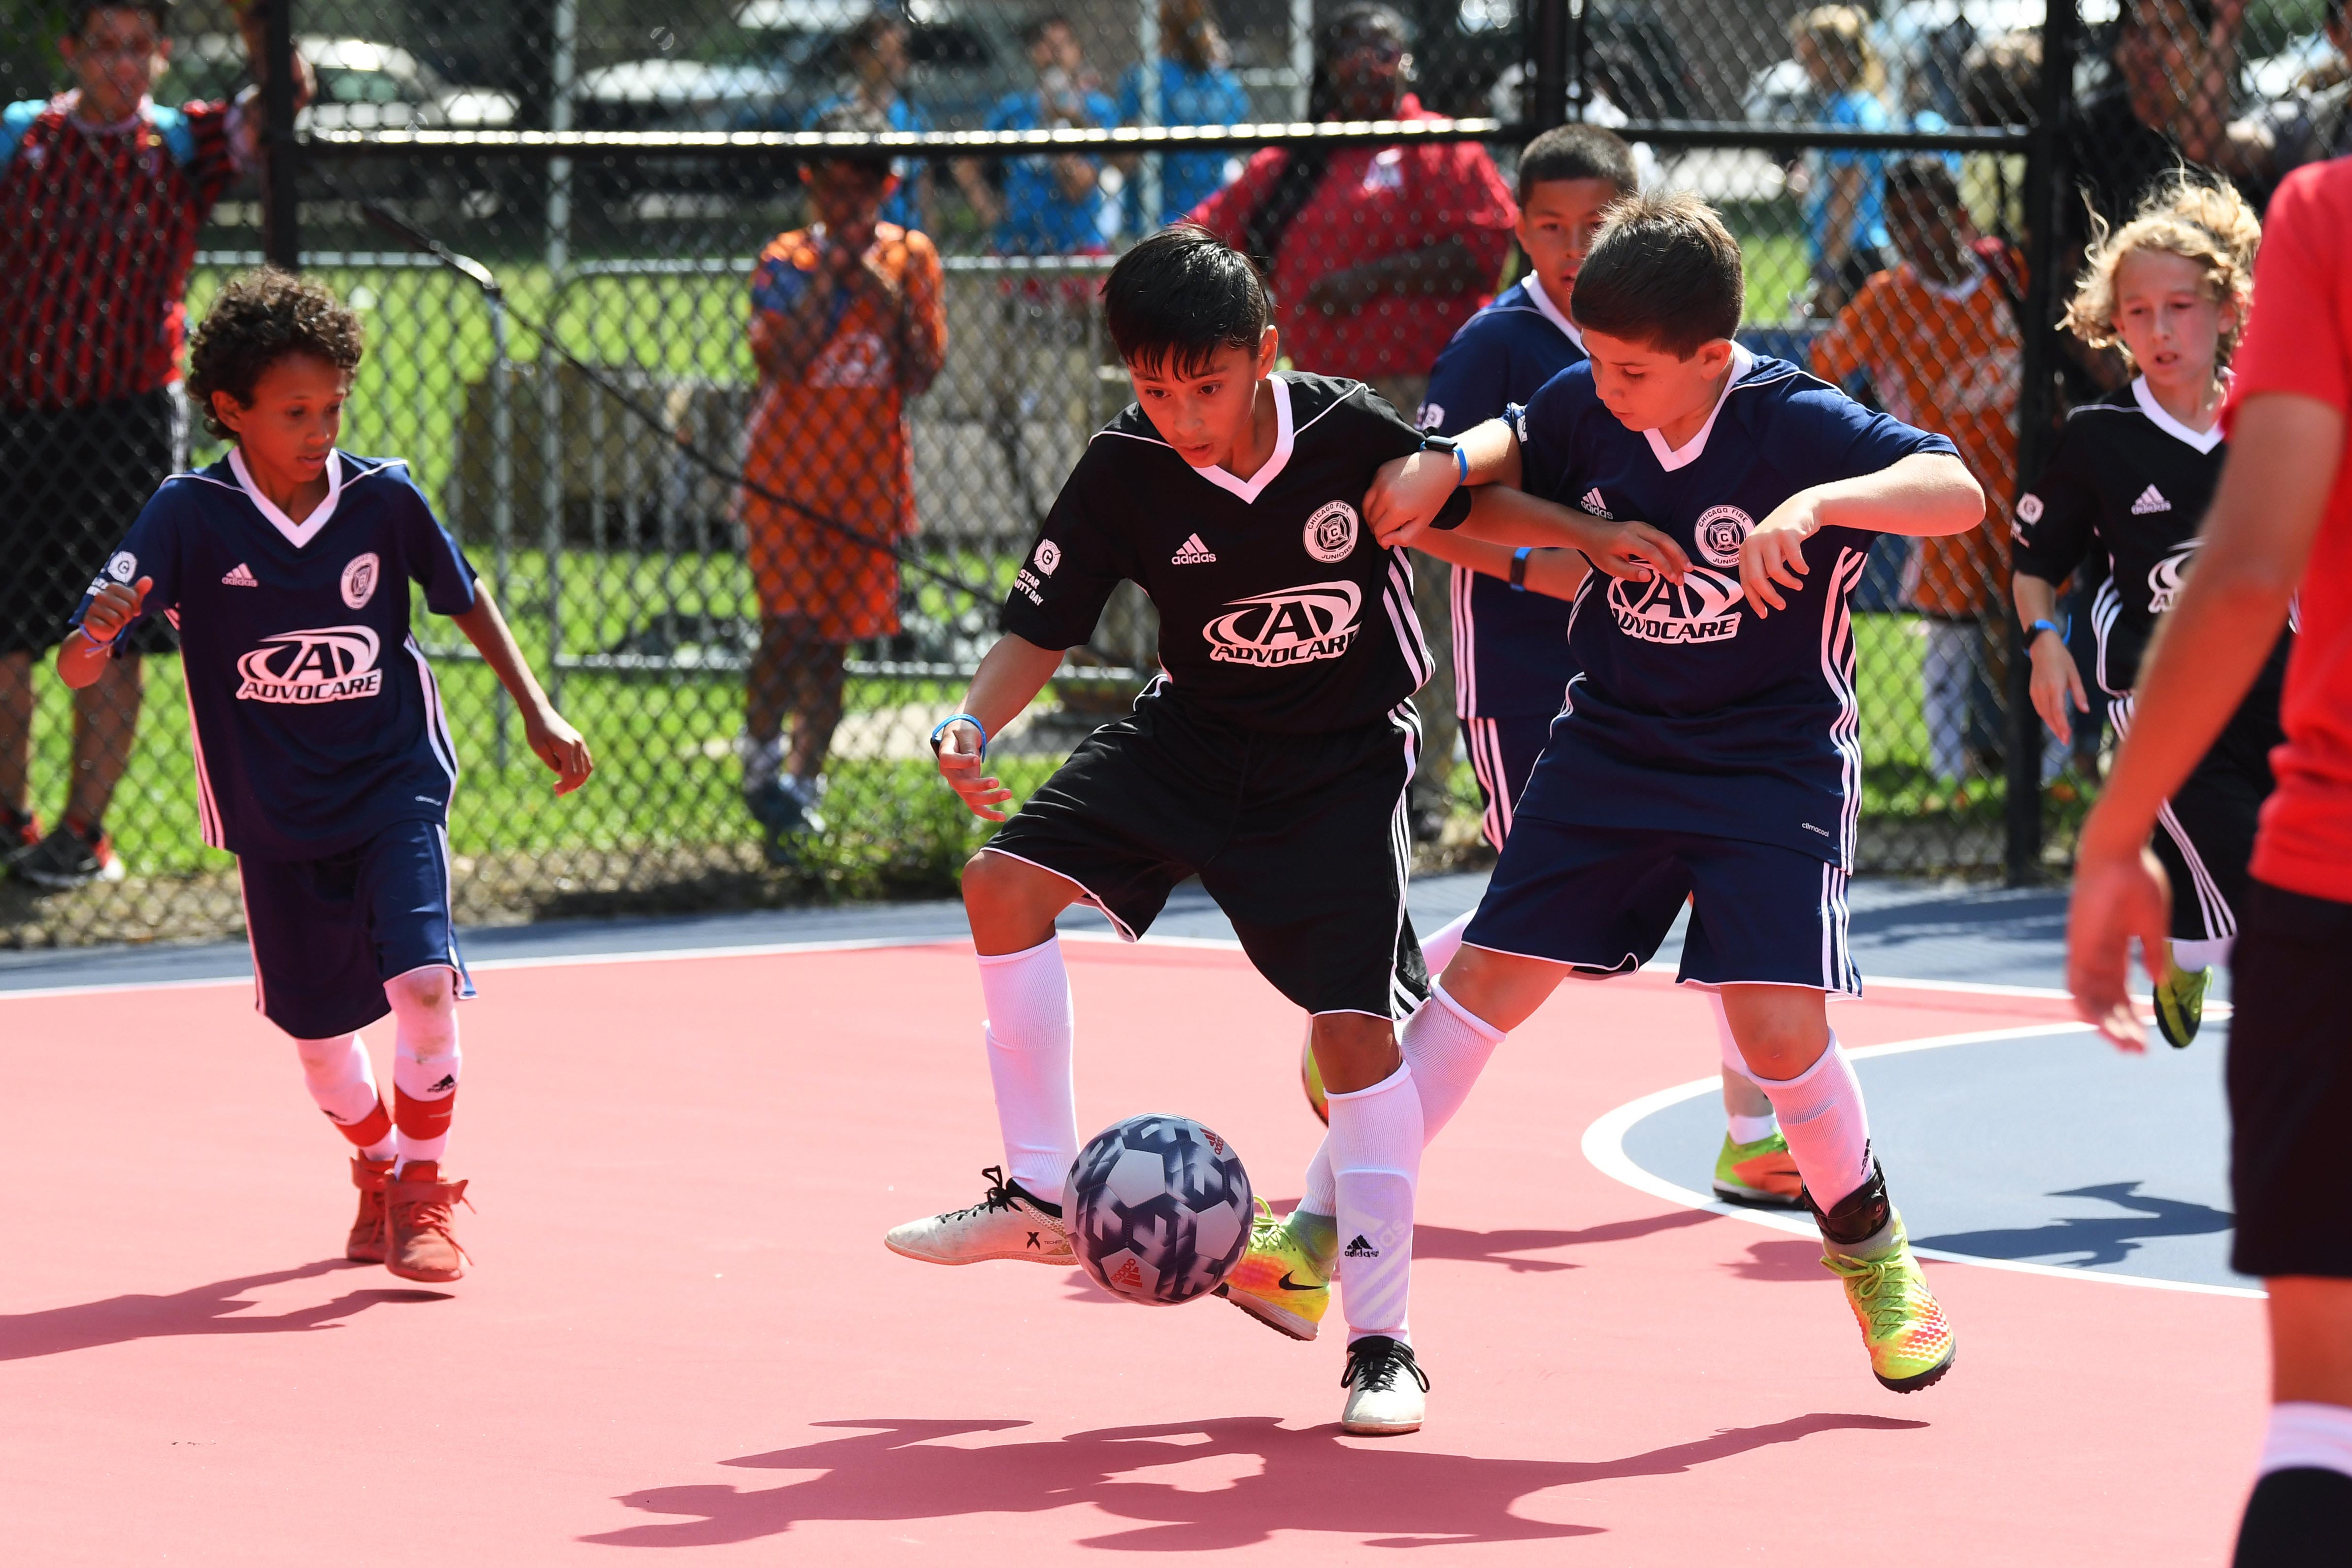 MLS: MLS All-Star-MLS WORKS Community Day